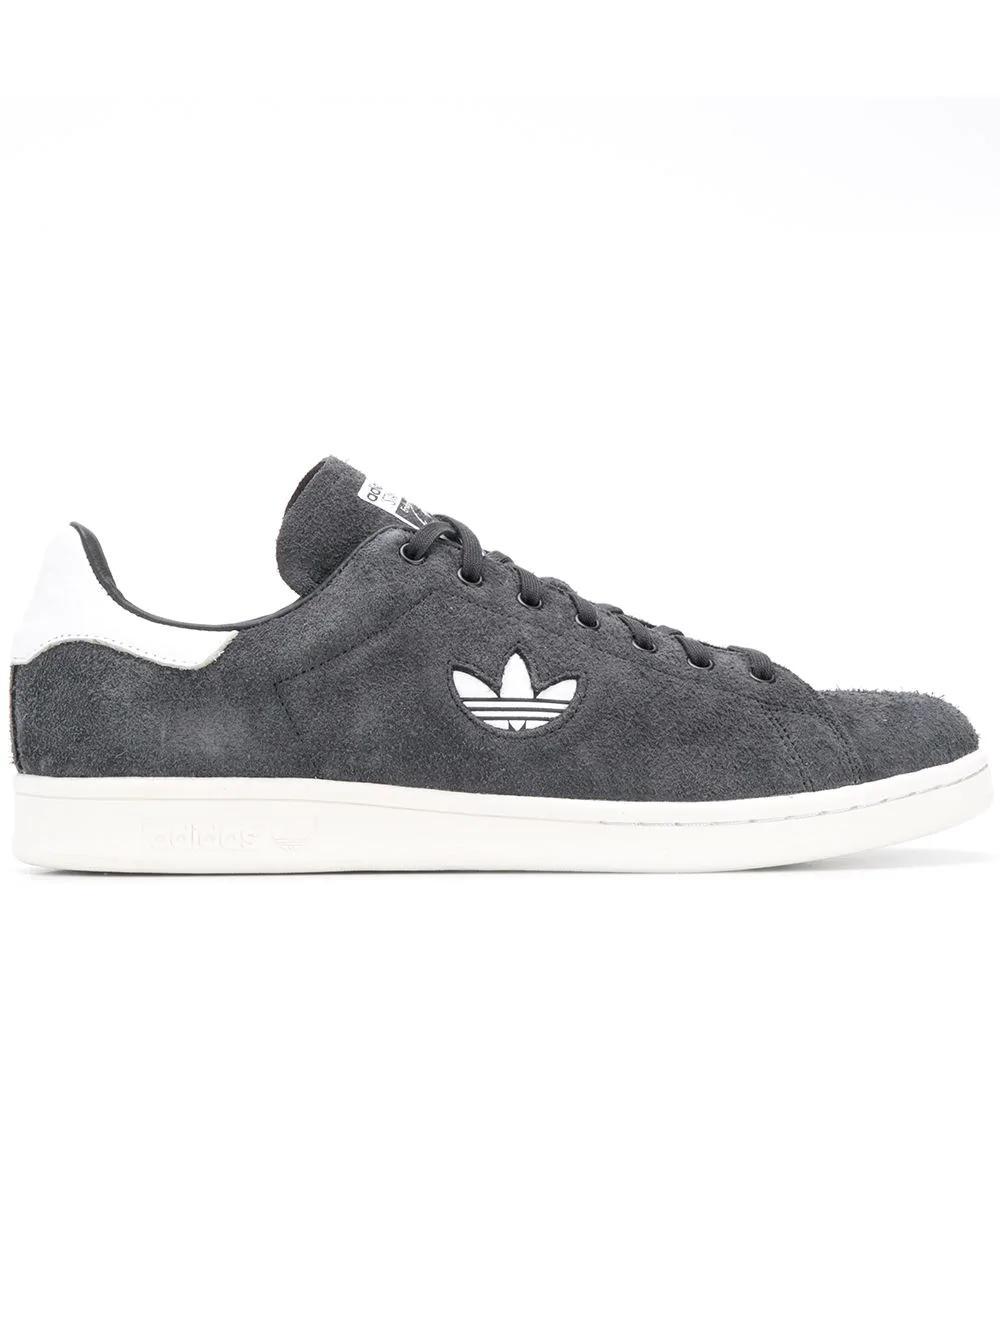 5d4992467d3a4 Adidas Originals Adidas Stan Smith Sneakers - Grey | ModeSens